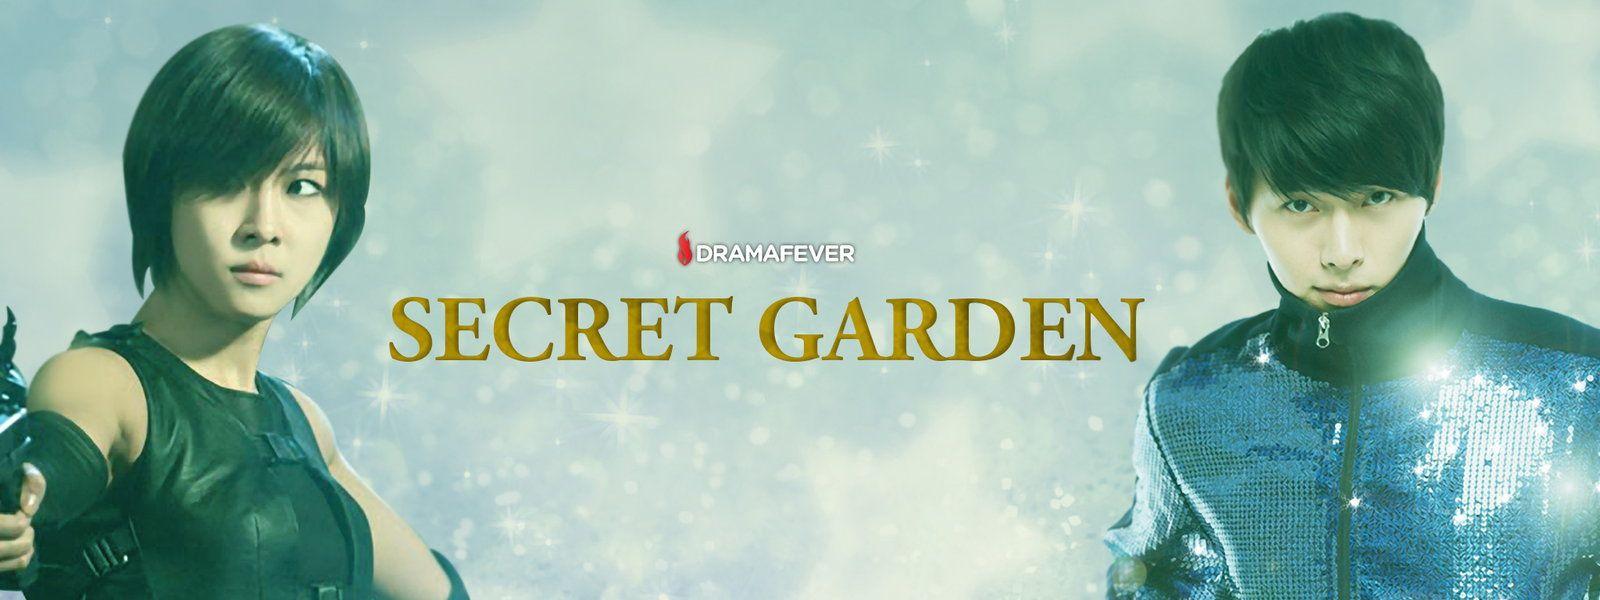 Watch Secret Garden online Free Hulu Secret garden